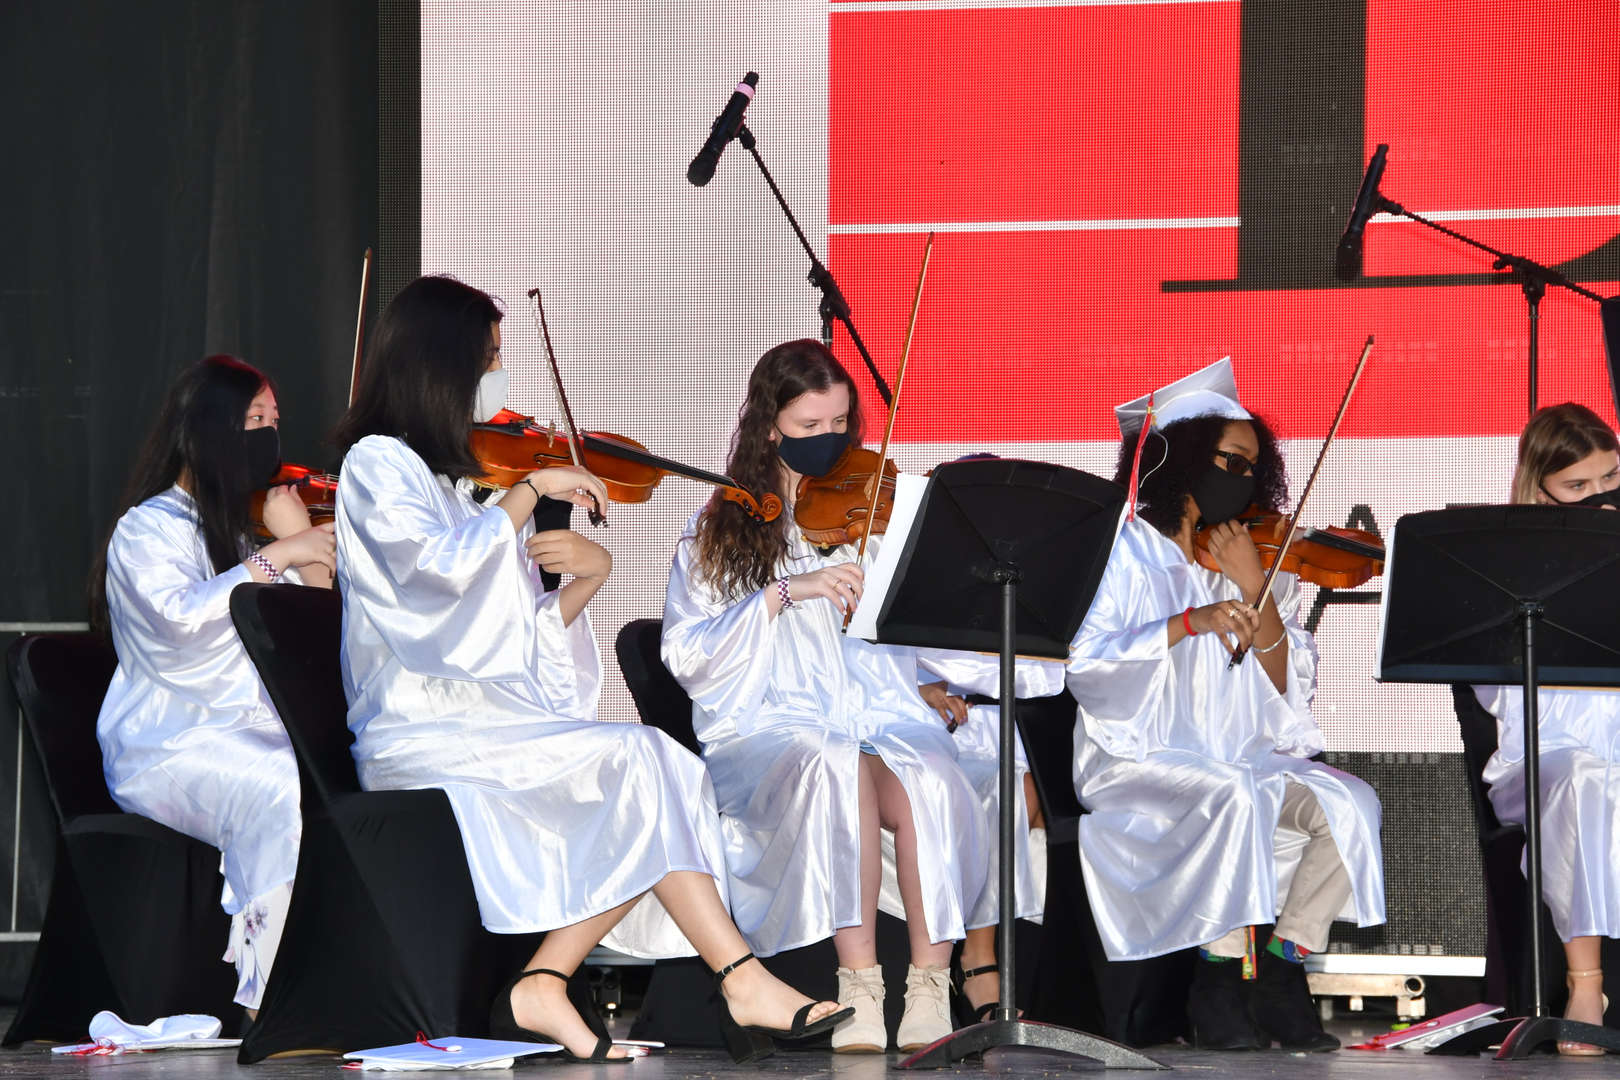 Strings Ensemble performing